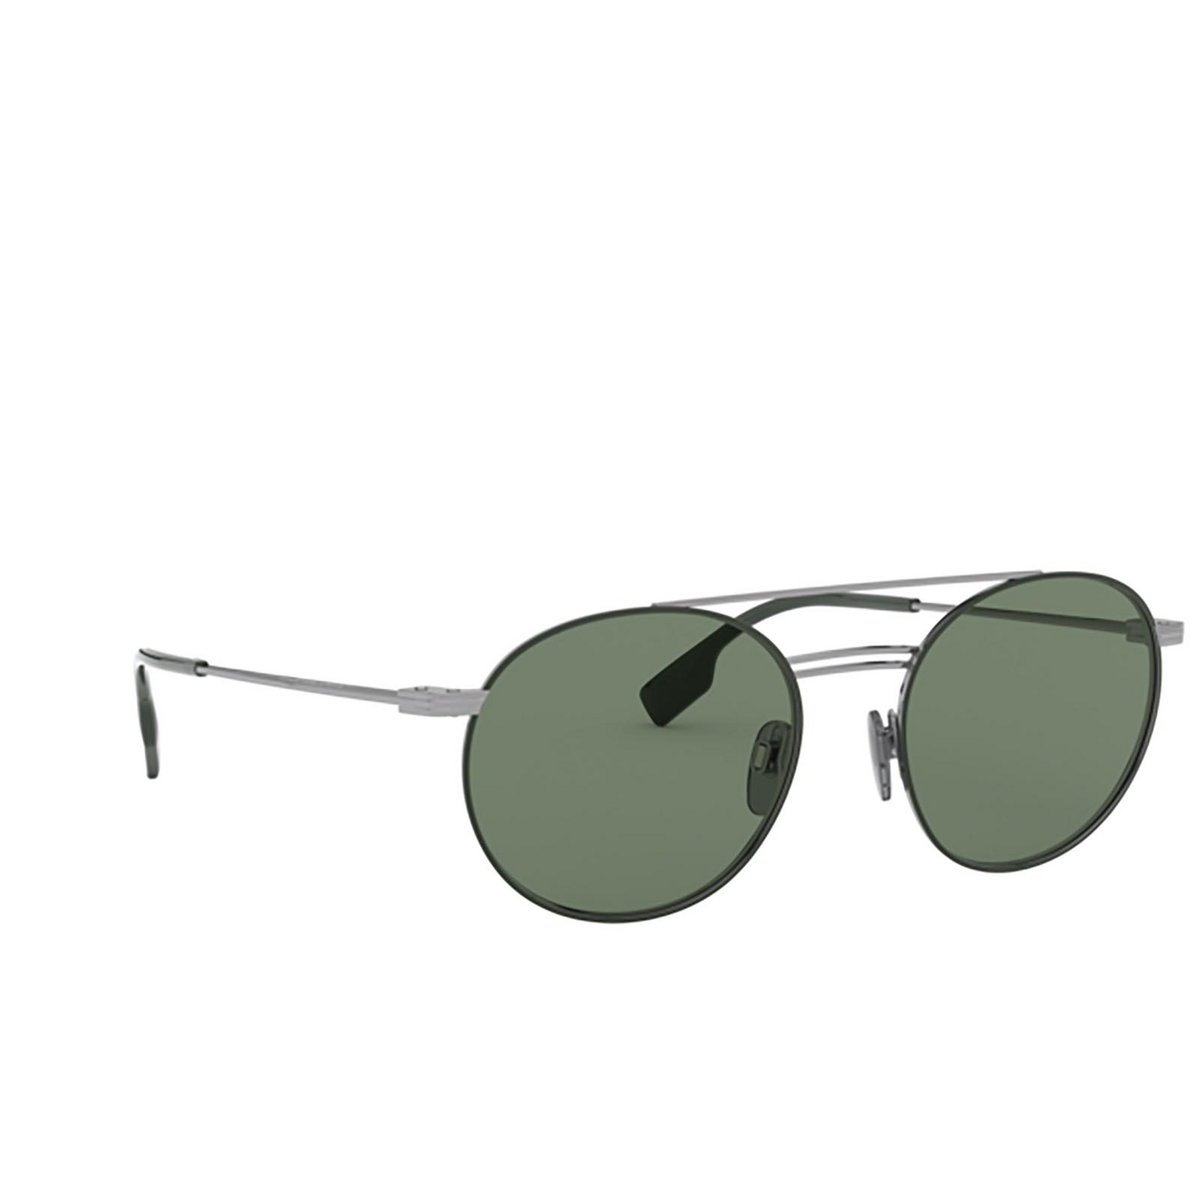 Burberry® Round Sunglasses: BE3109 color Gunmetal / Matte Green 100371 - three-quarters view.